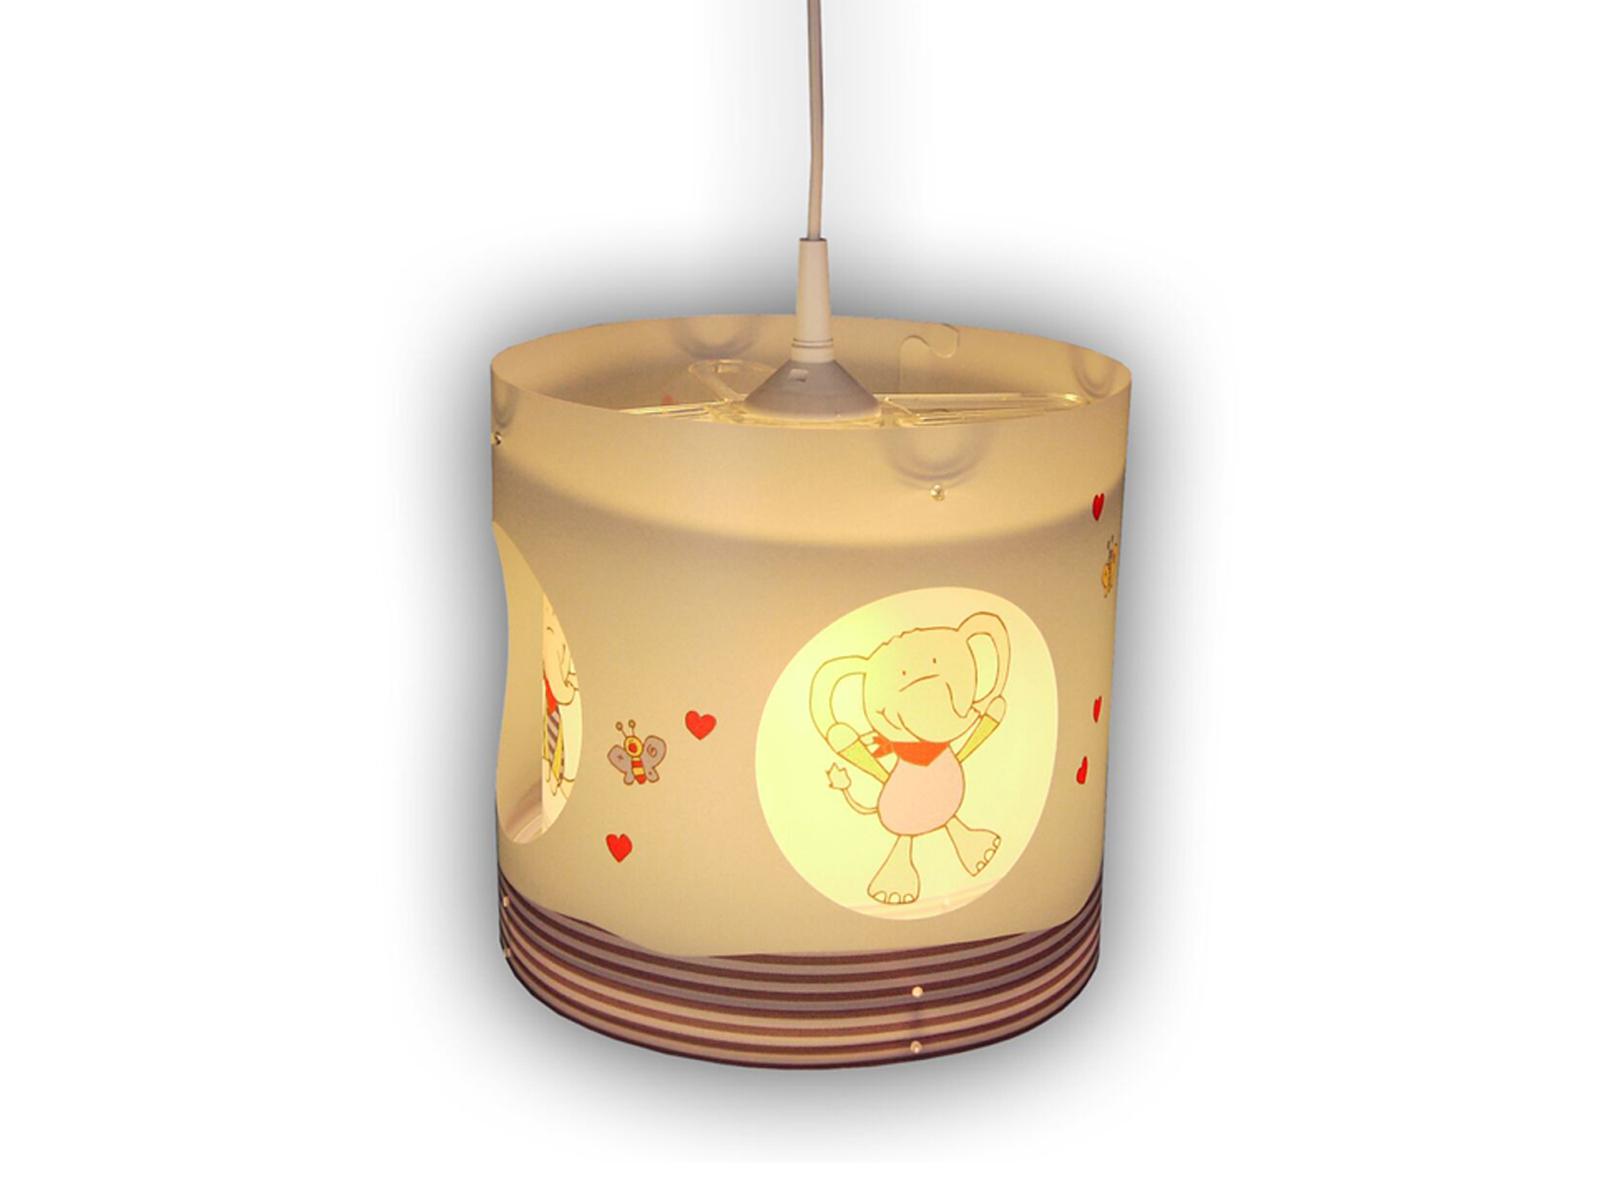 Kinder Led Pendelleuchte Drehend Lolo Lombardo Dimmbar Kinderzimmer Lampe Decke